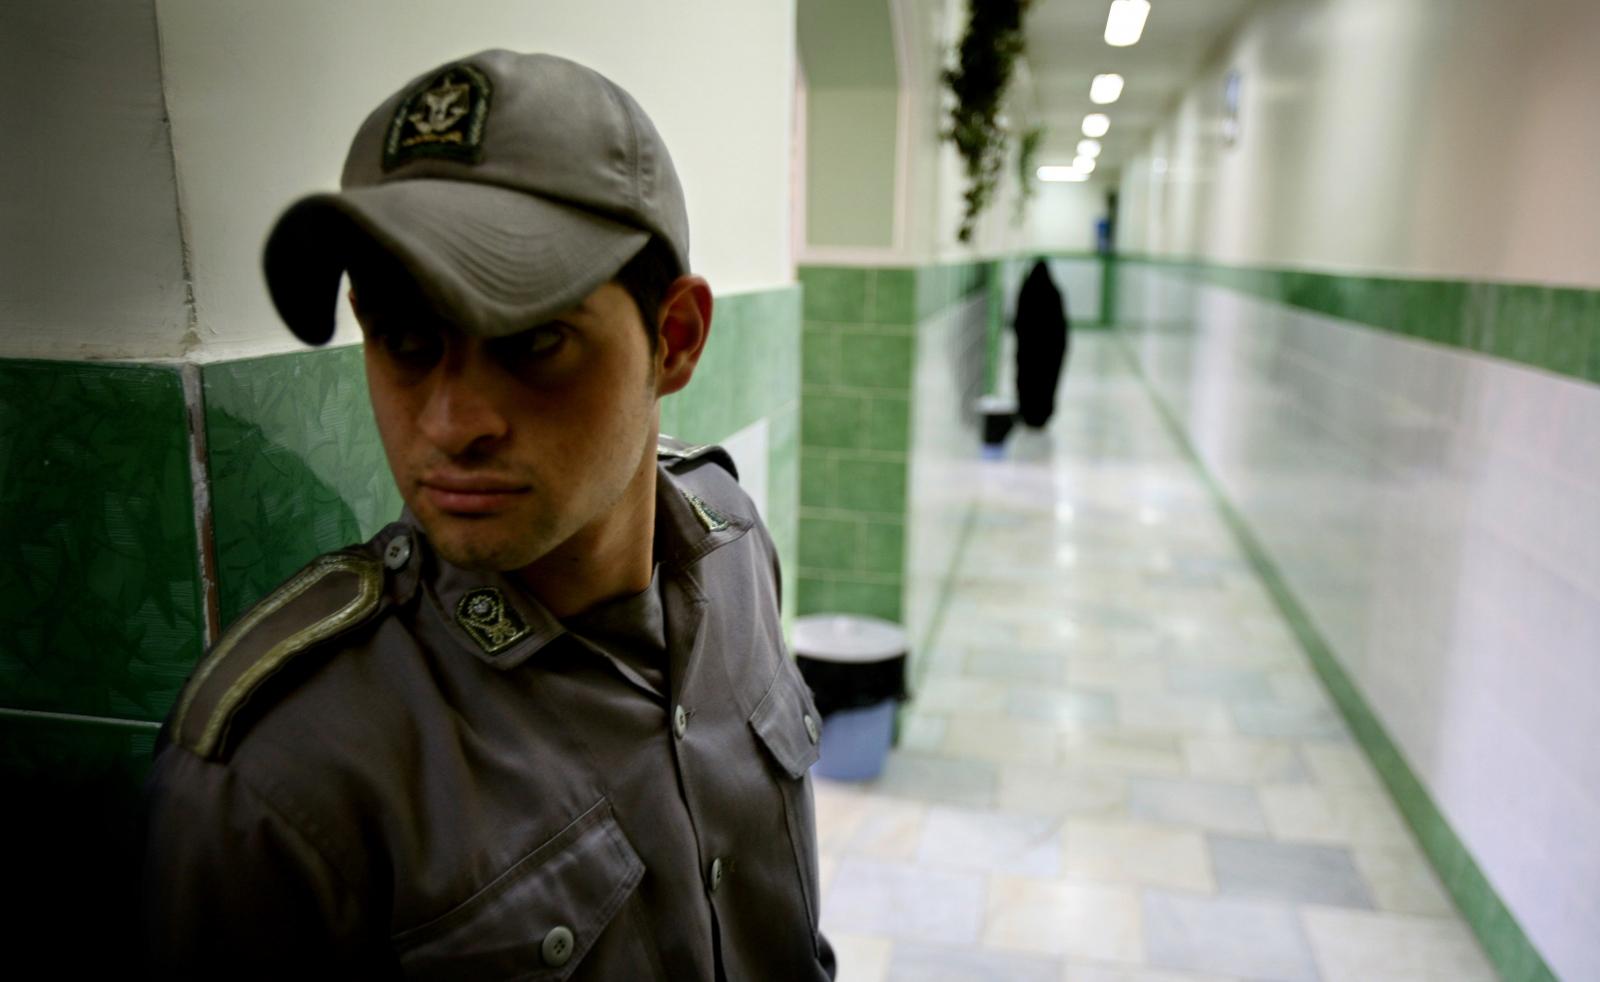 Tehran's Evin prison